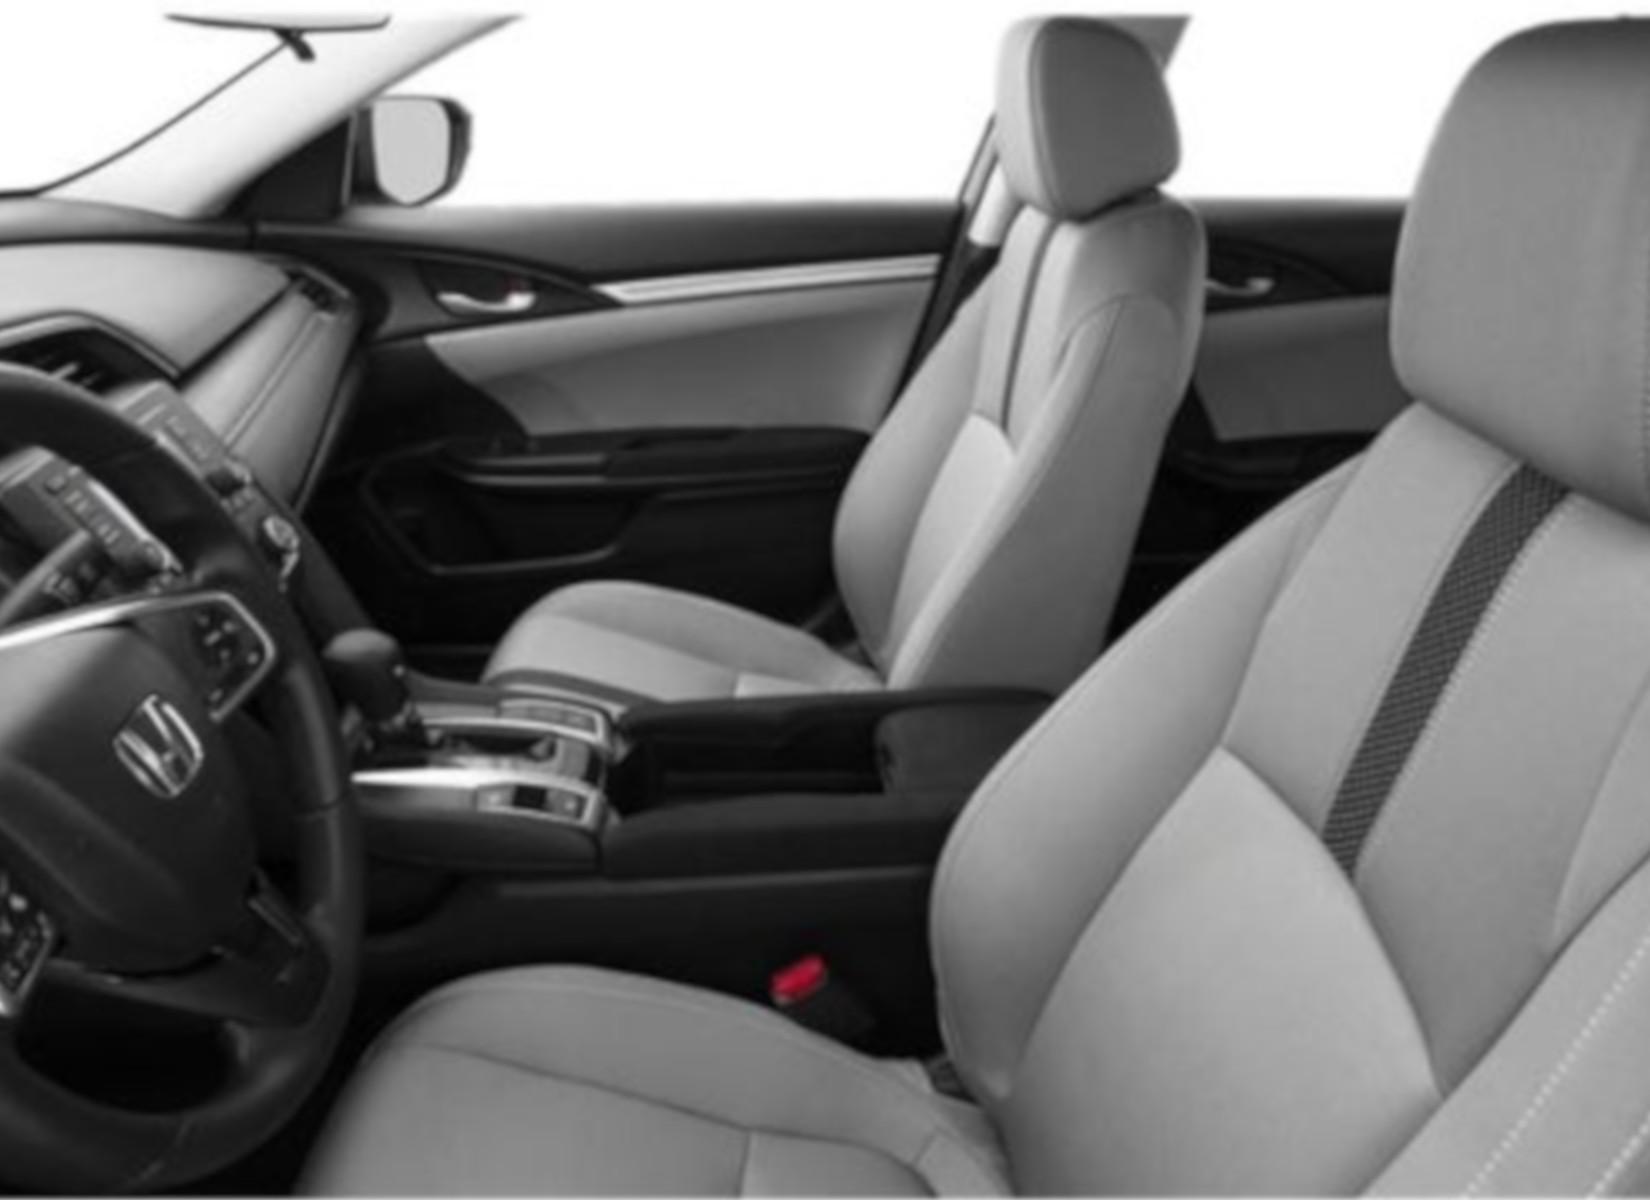 The spacious interior of the 2019 Honda Civic